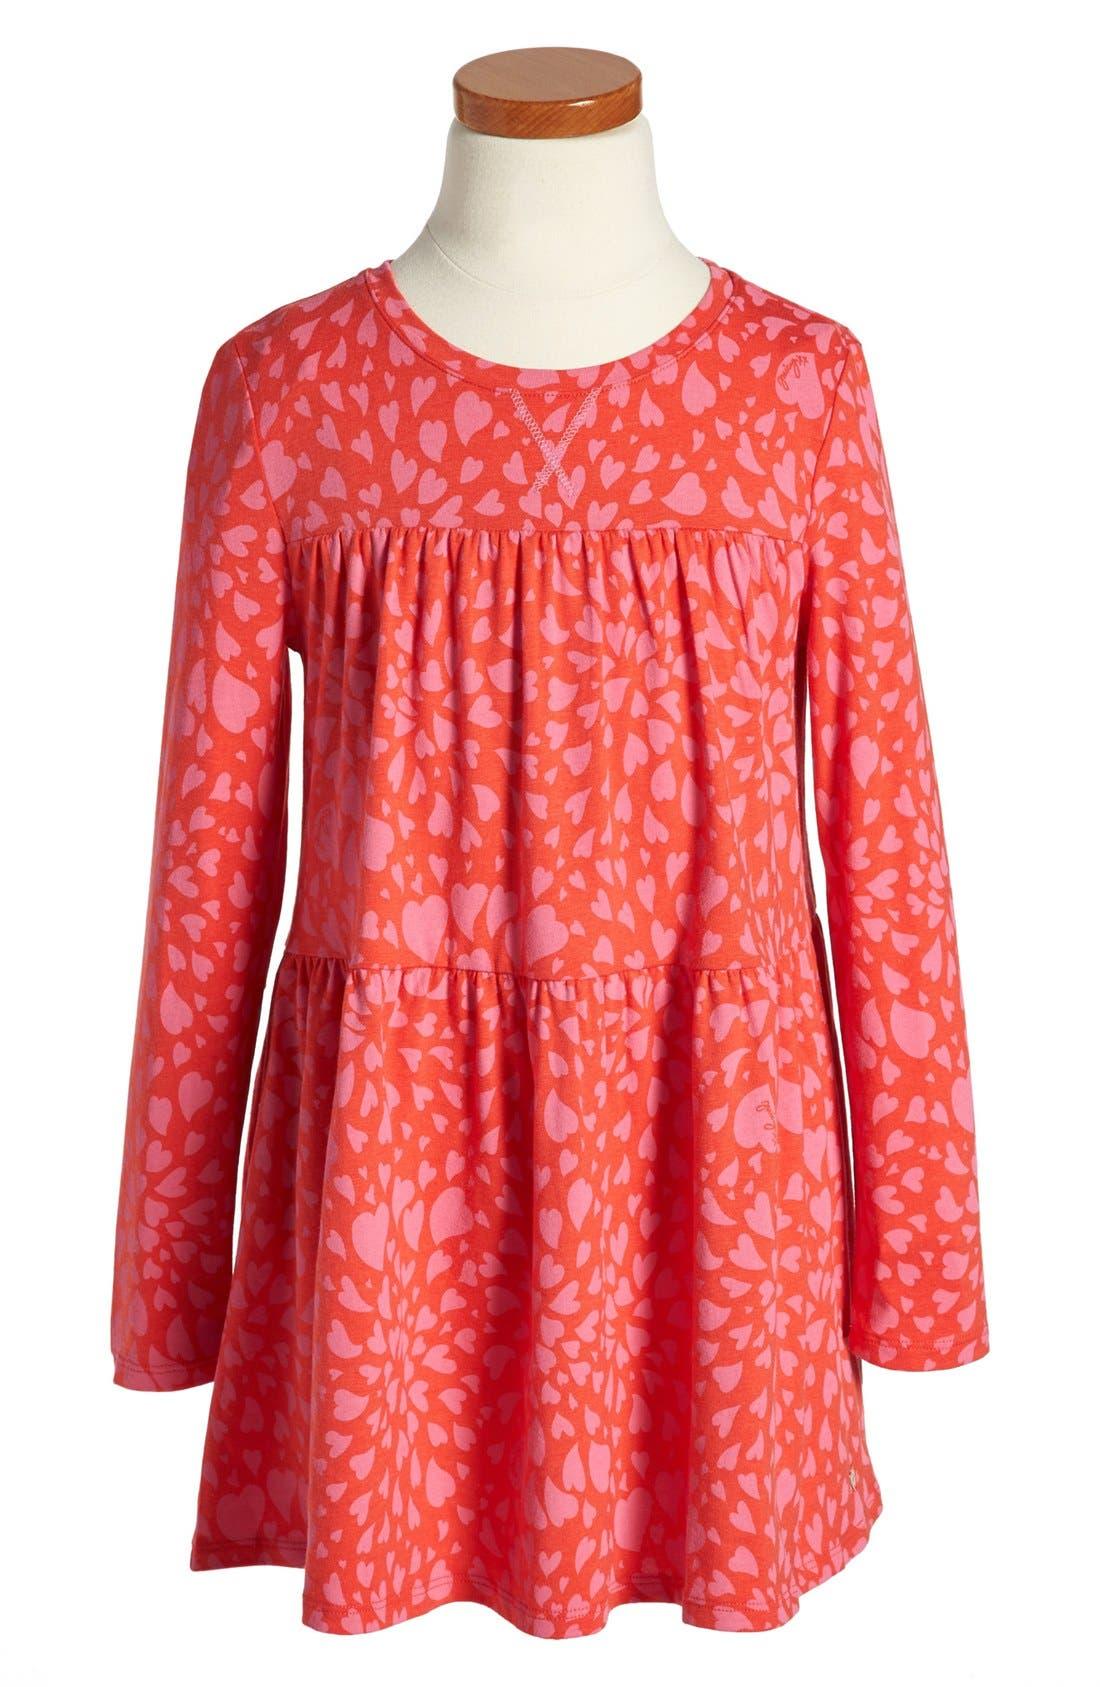 Alternate Image 1 Selected - Juicy Couture 'Heart Swirl' Knit Dress (Toddler Girls, Little Girls & Big Girls)